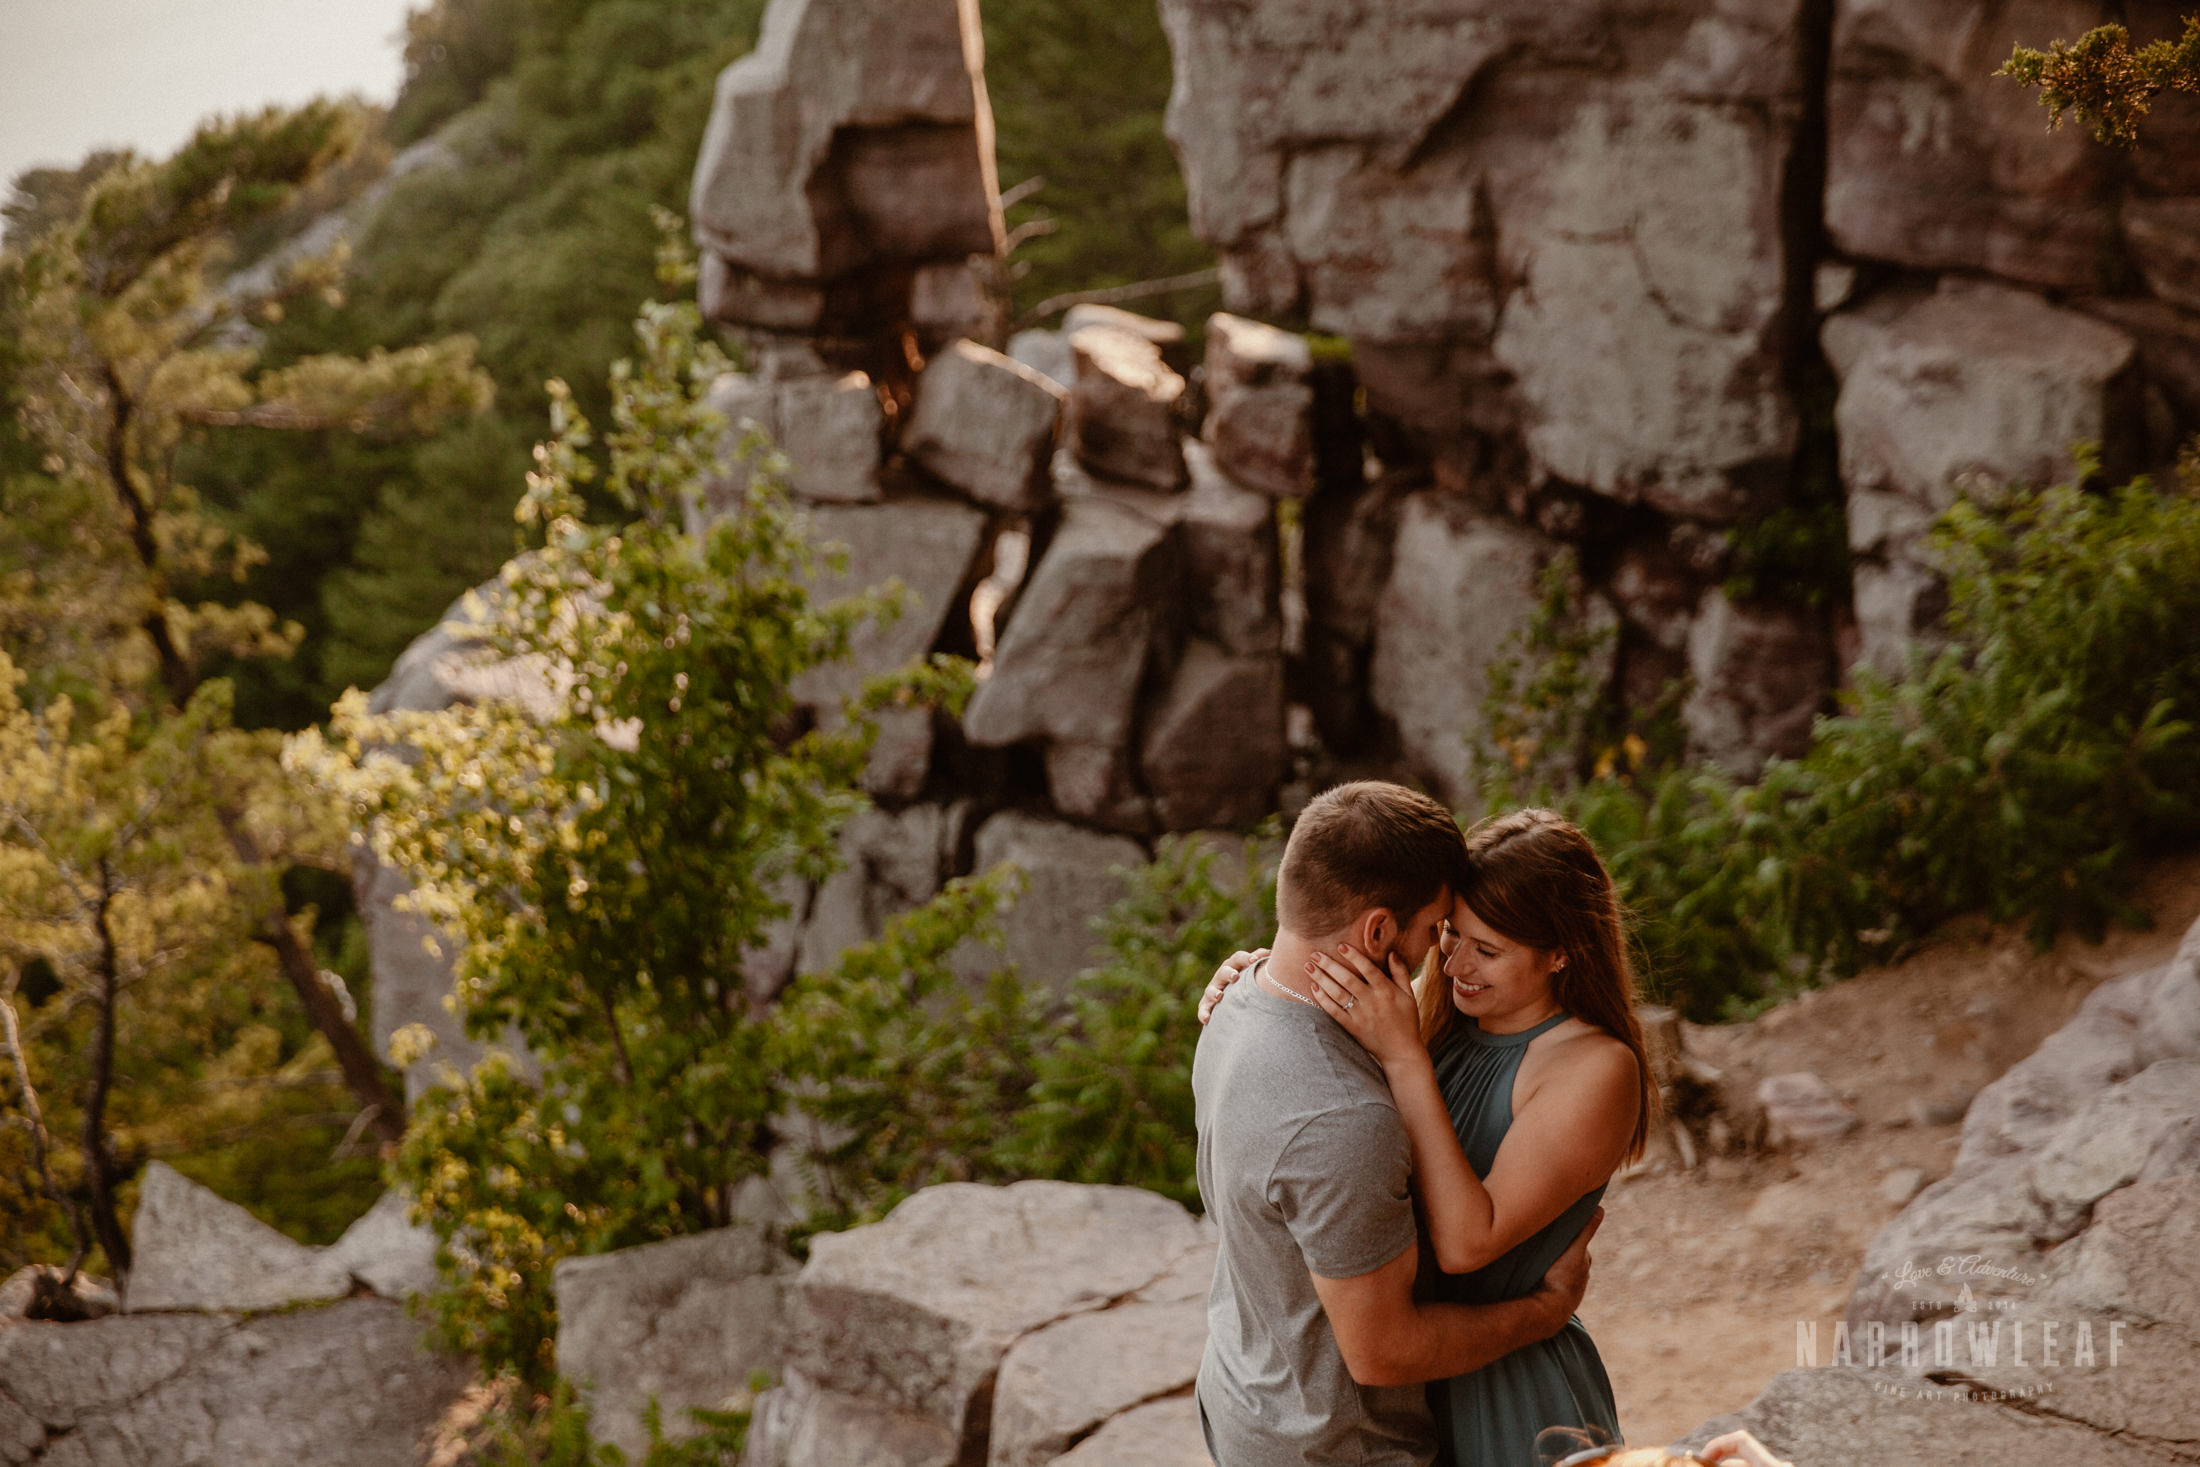 wedding-adventure-photographer-Narrowleaf_Love_and_Adventure_Photography-9379.jpg